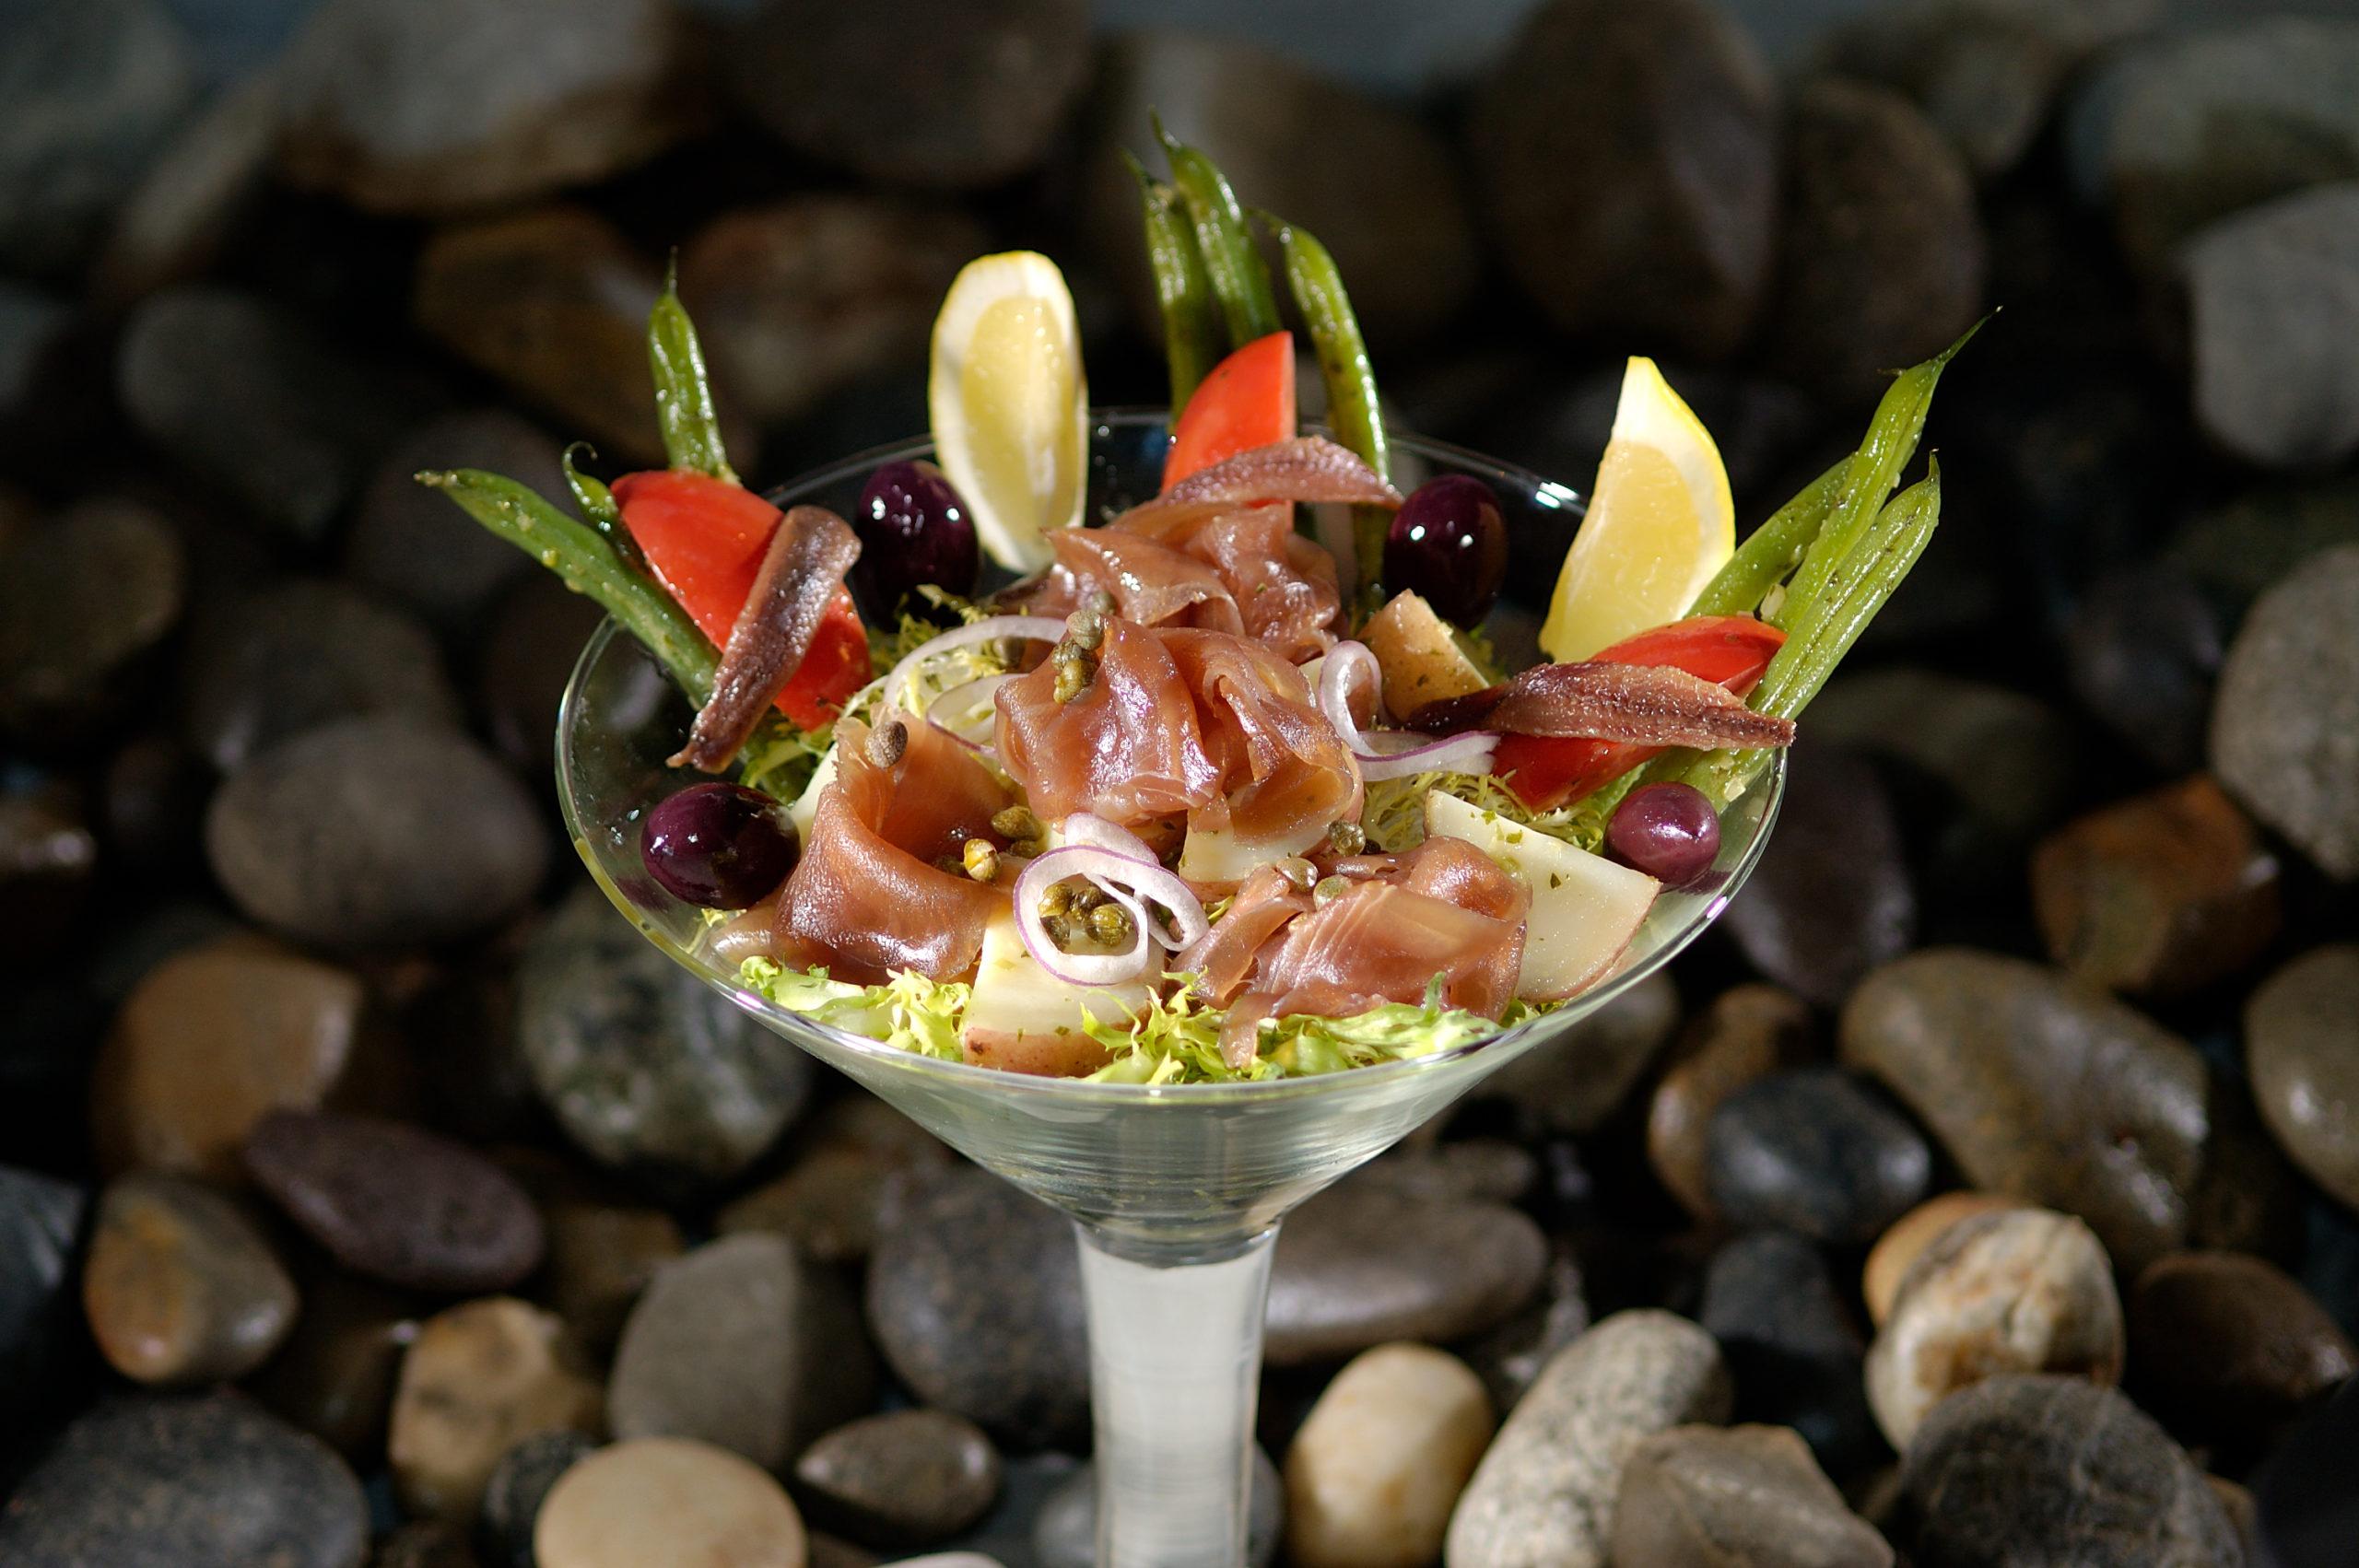 Sliced Smoked Yellowfin Tuna